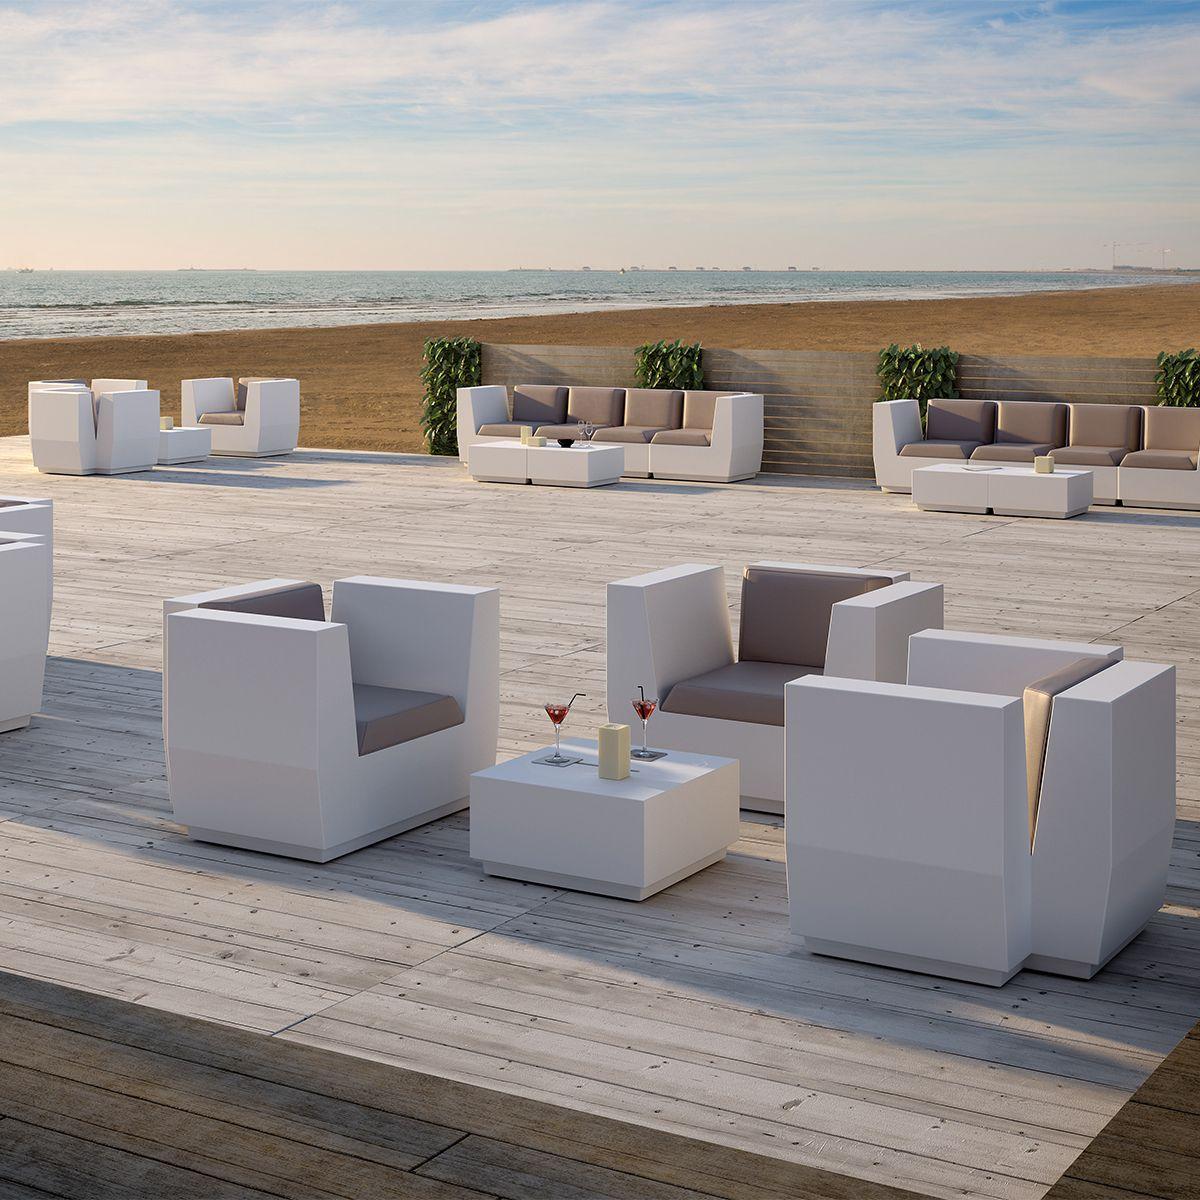 Poltrone sedute divani modulari polietilene Big Cut.